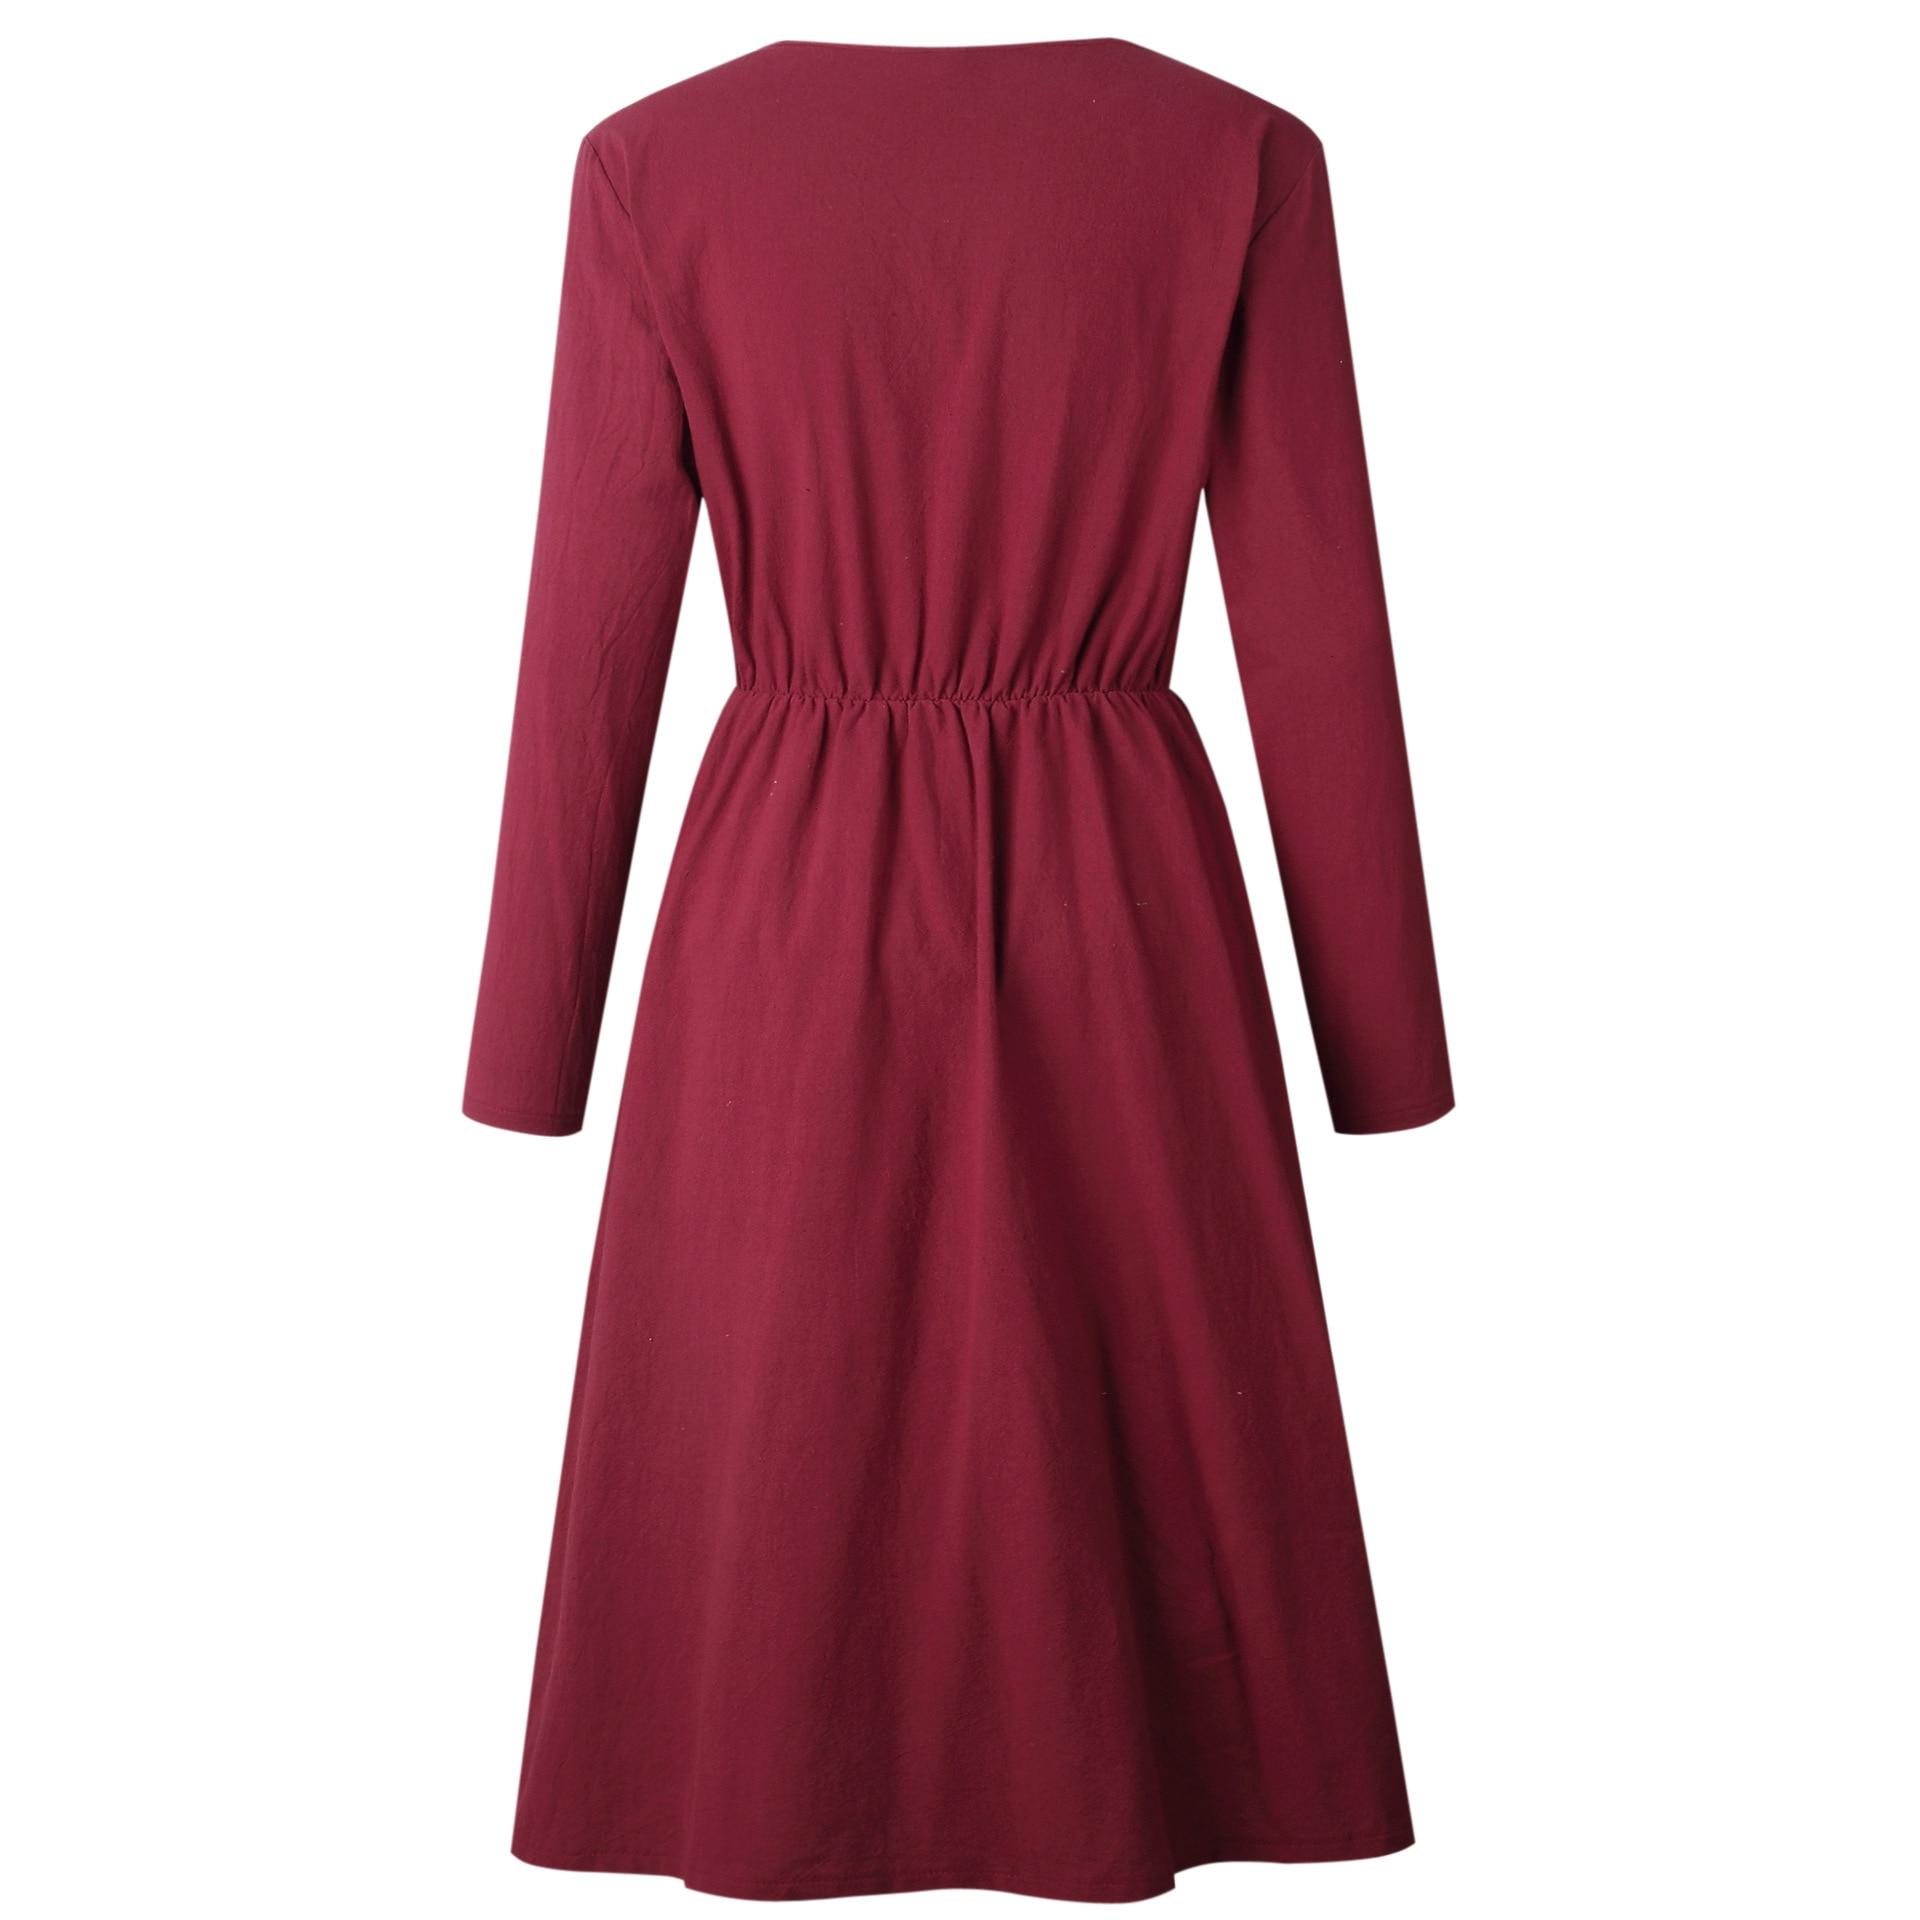 Red Blue A Line Casual Dresses Women Autumn Dress 19 Vintage Long Sleeve Dress For Ladies Buttons V Neck Midi Vestidos Female 27